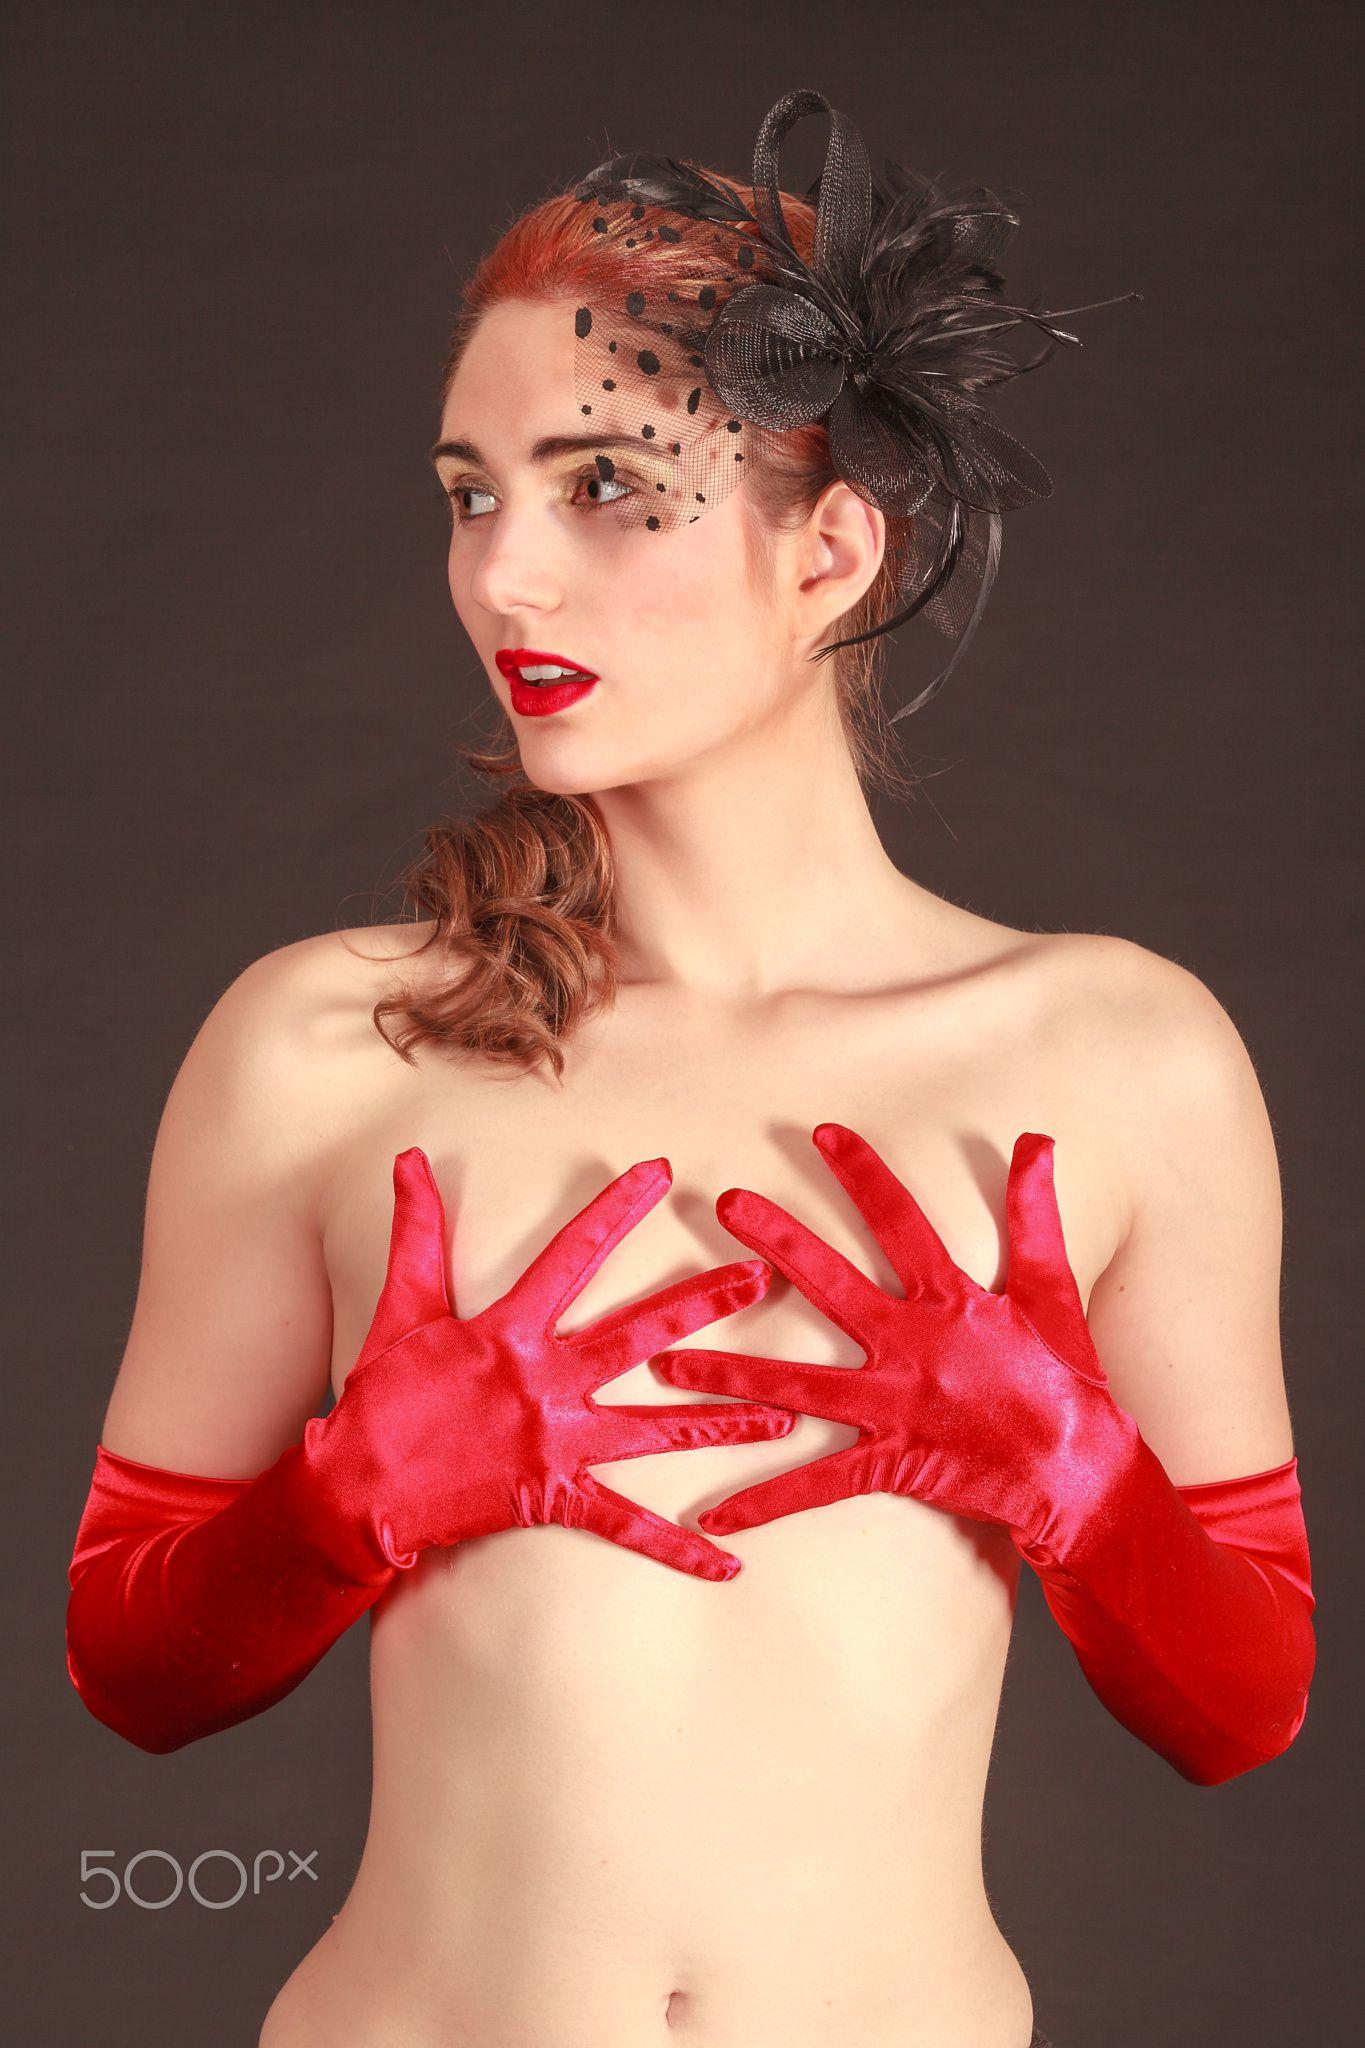 Veranstaltungen female naked young pictures of models. nachrichten starnberg